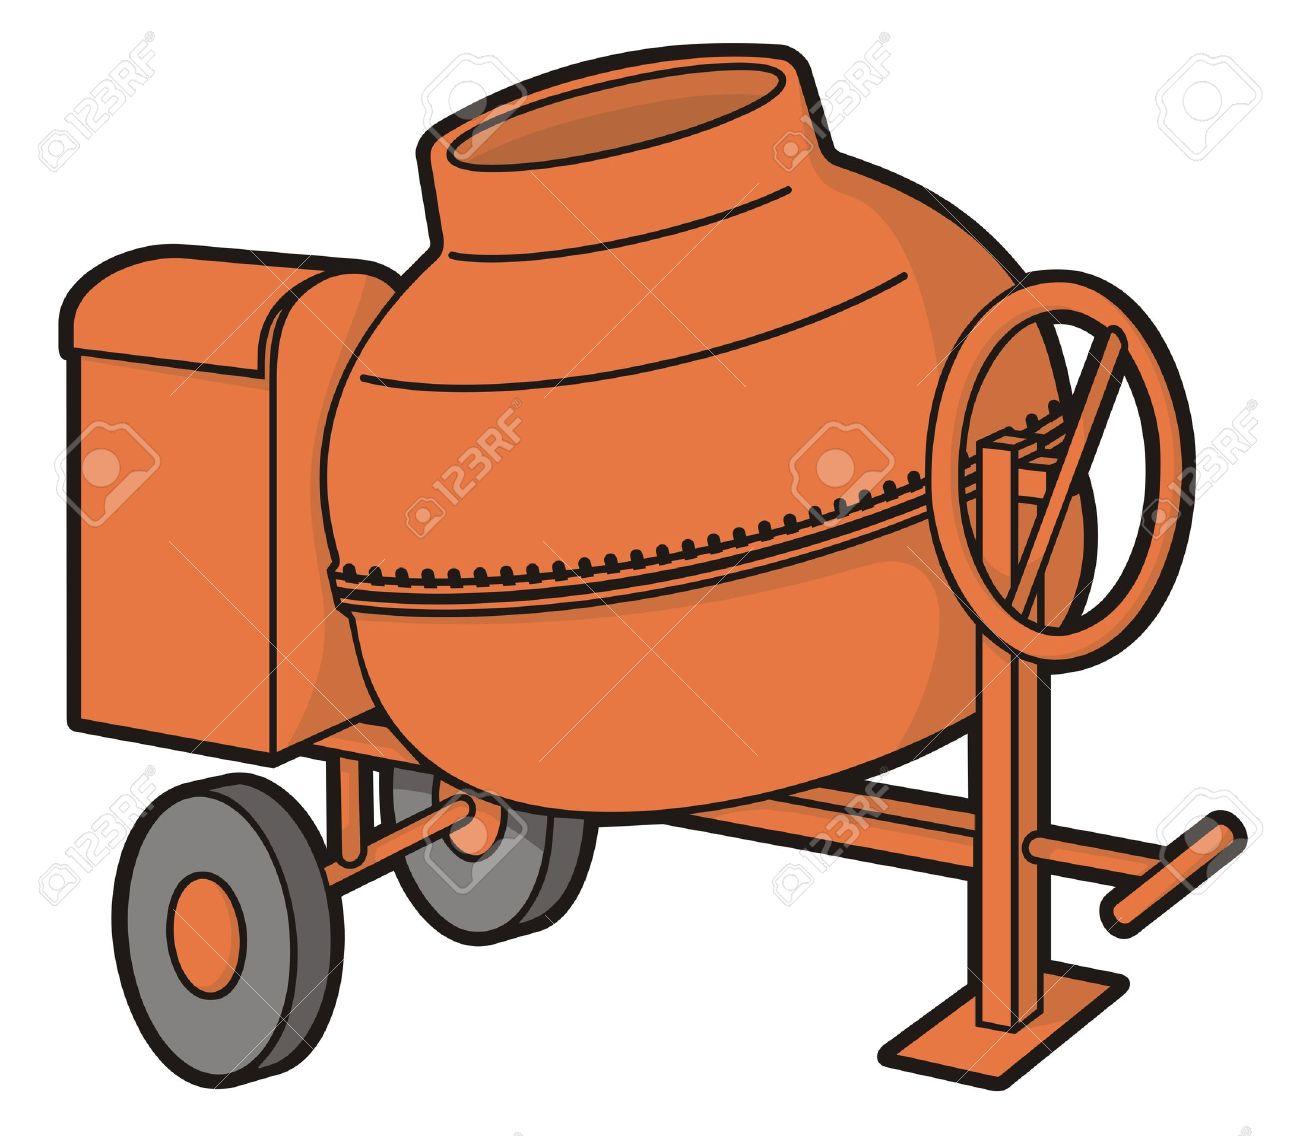 Orange mini concrete mixer with wheels illustration isolated on white background. Stock Vector - 9555523